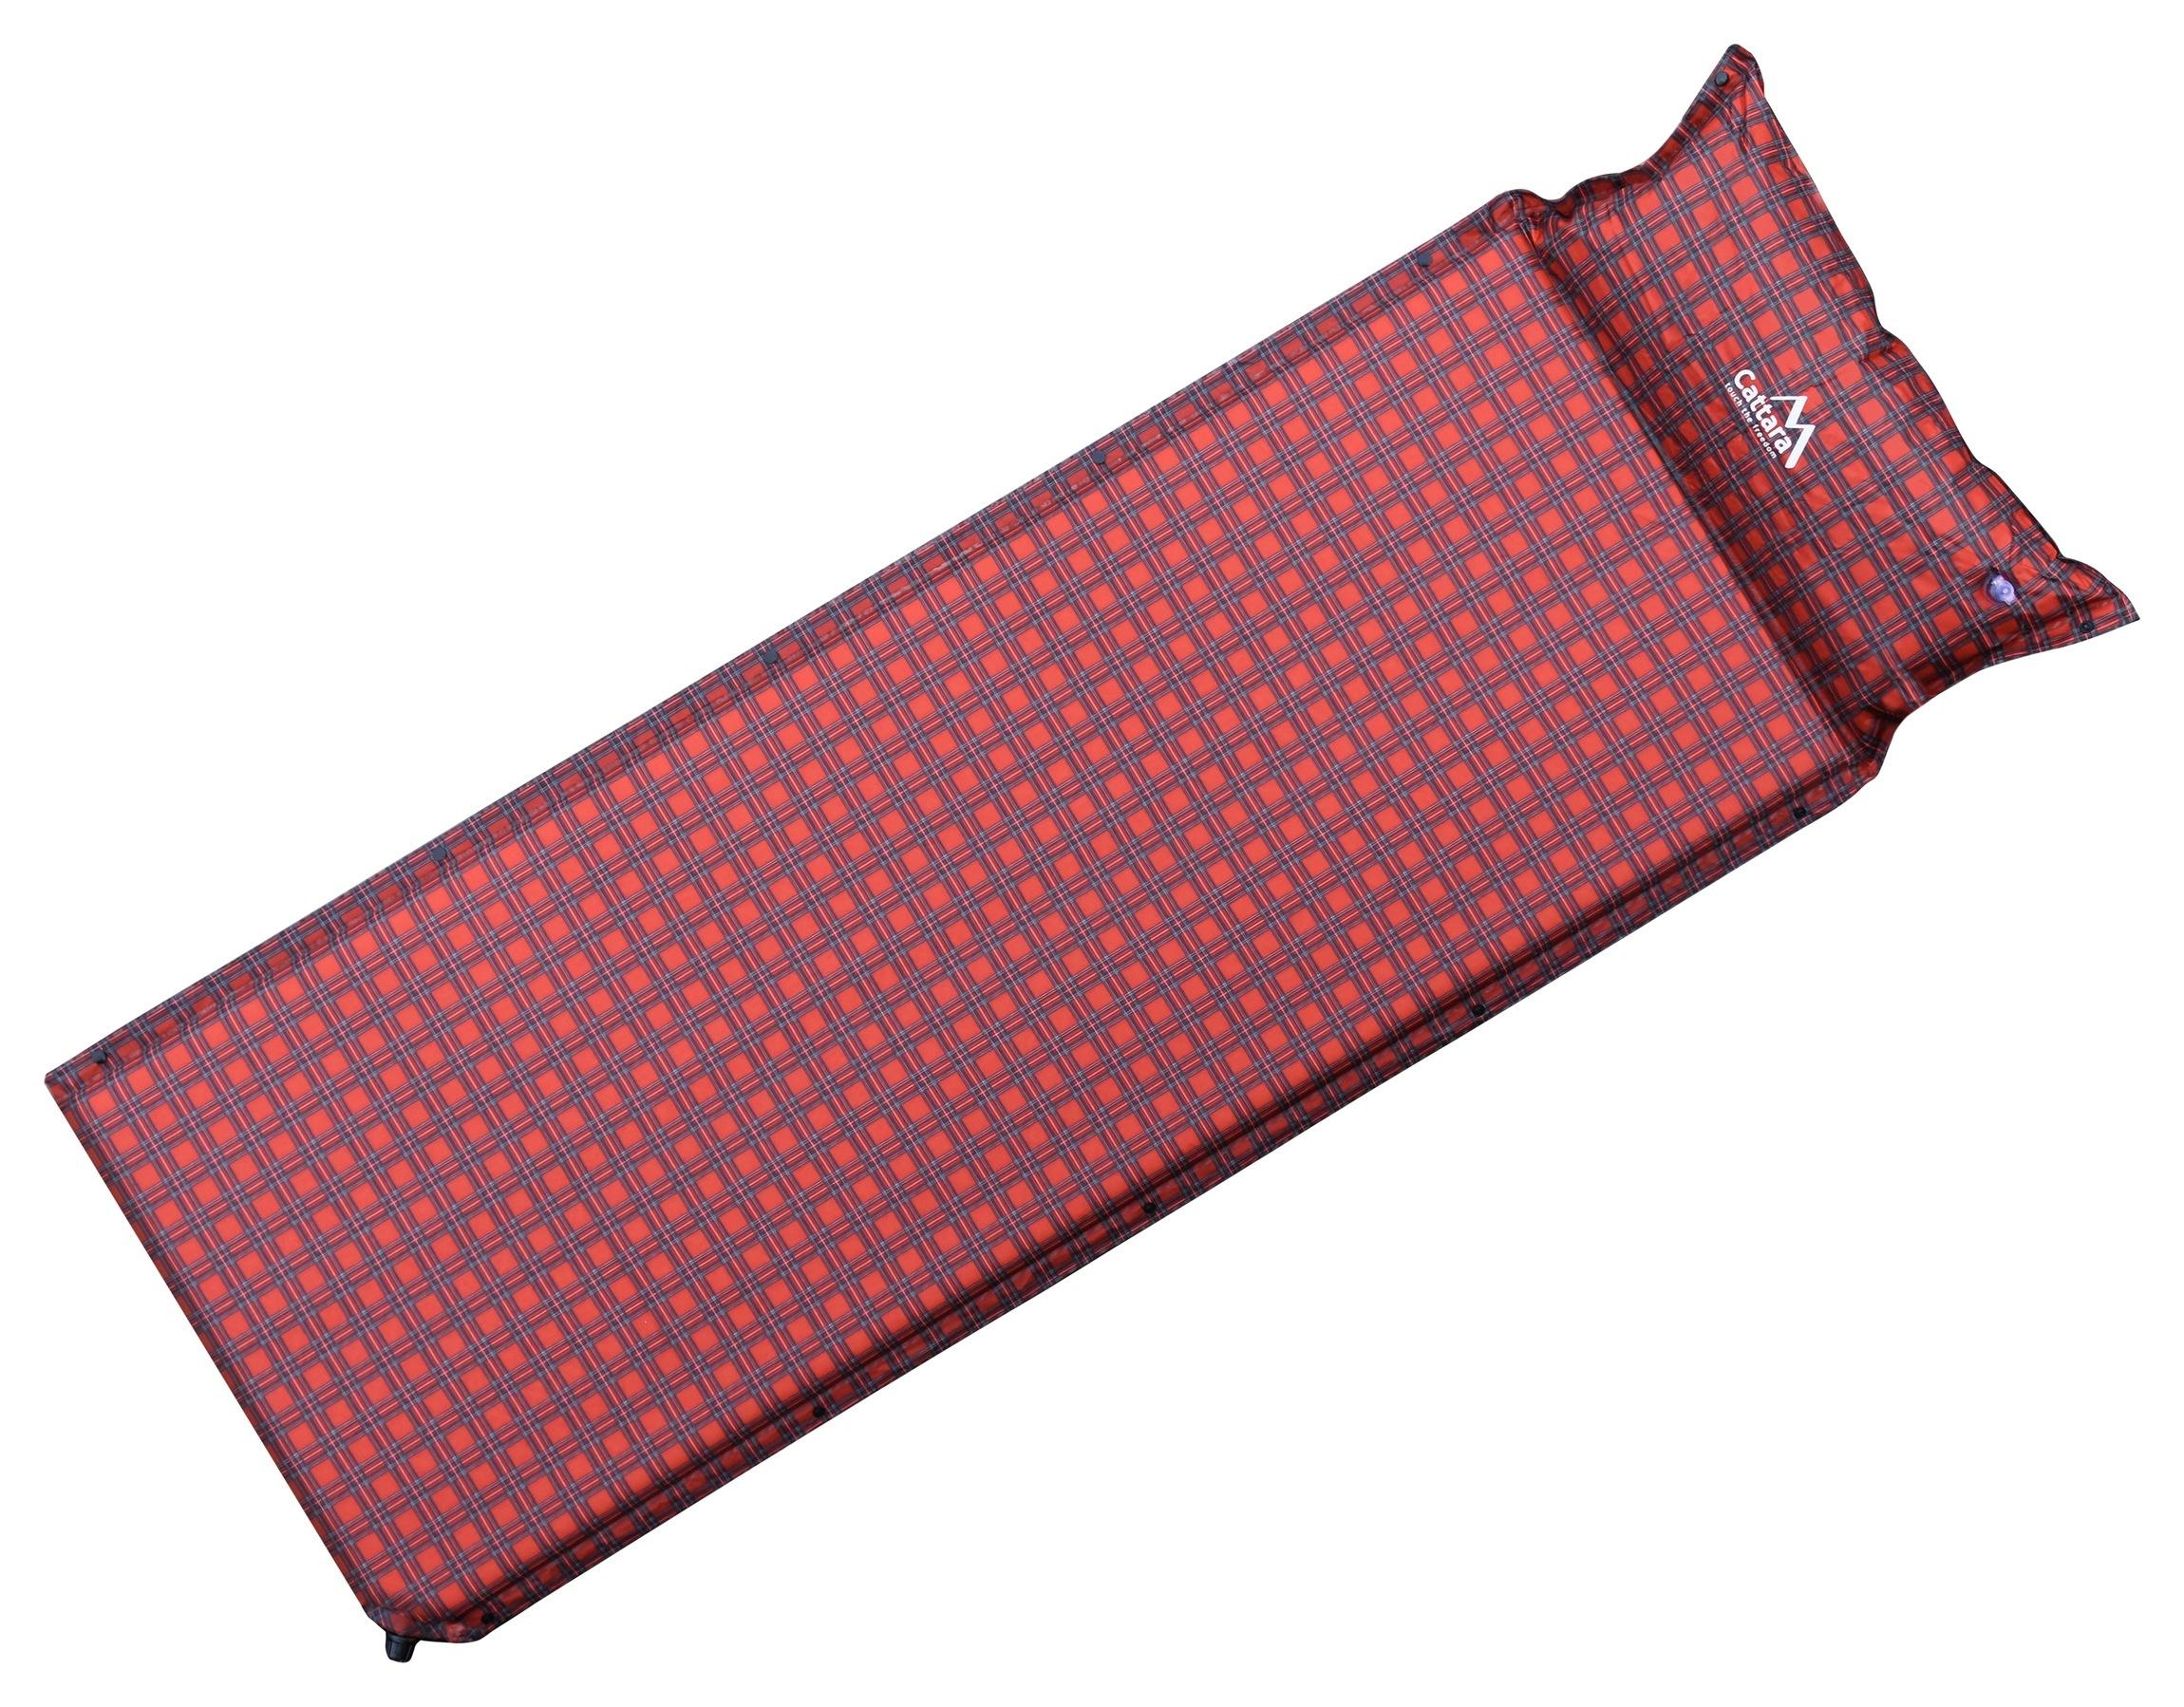 Cattara - Karimatka samonafukovací 190x60x3,8cms polštářem KILT